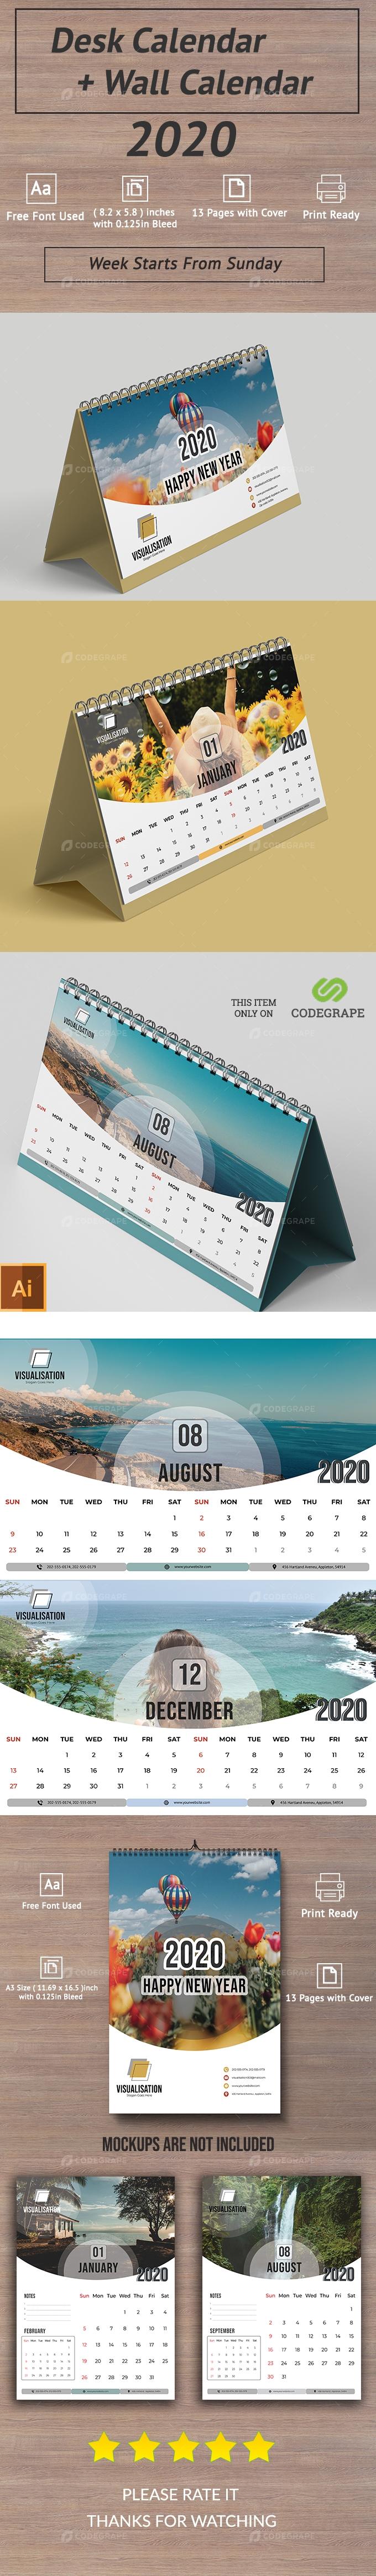 Wall Calendar + Desk Calendar (Exclusive Package)